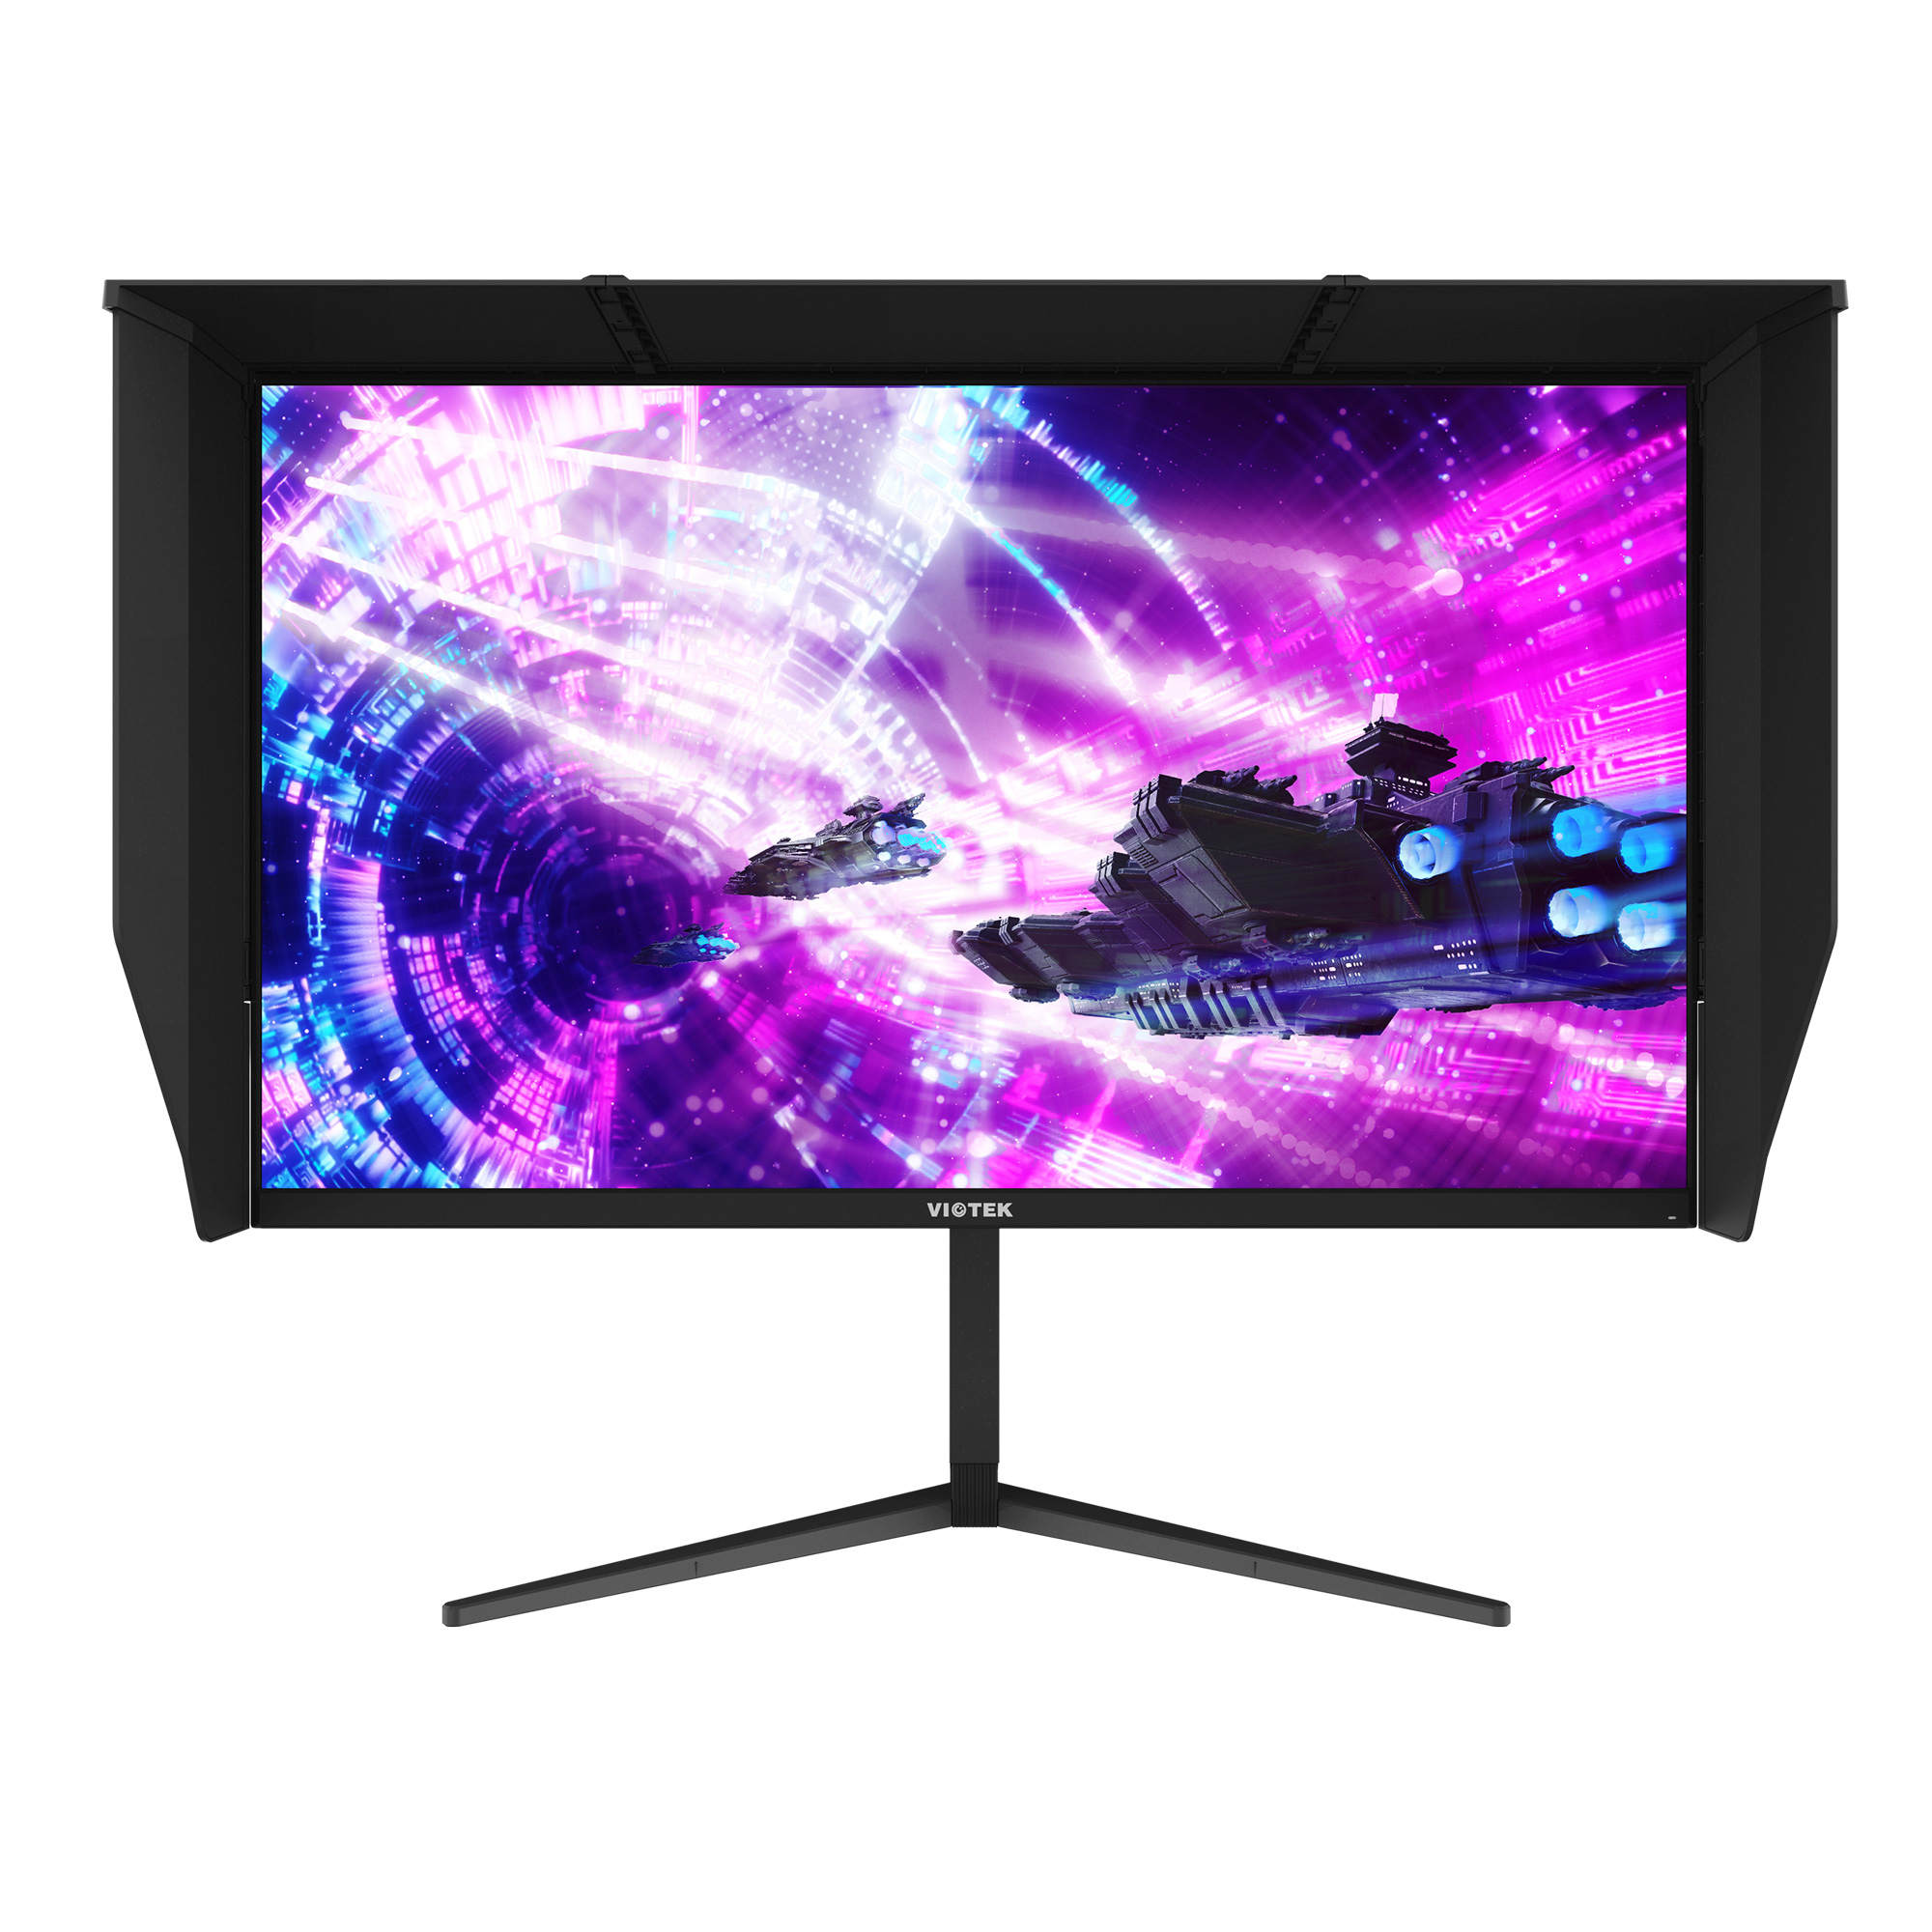 "GFI27XQA 27"" IPS 4K Gaming Monitor — 144Hz, 1MS (OD), UHD | HDR-Ready w/ FreeSync & G-SYNC Compatibility (VESA)"